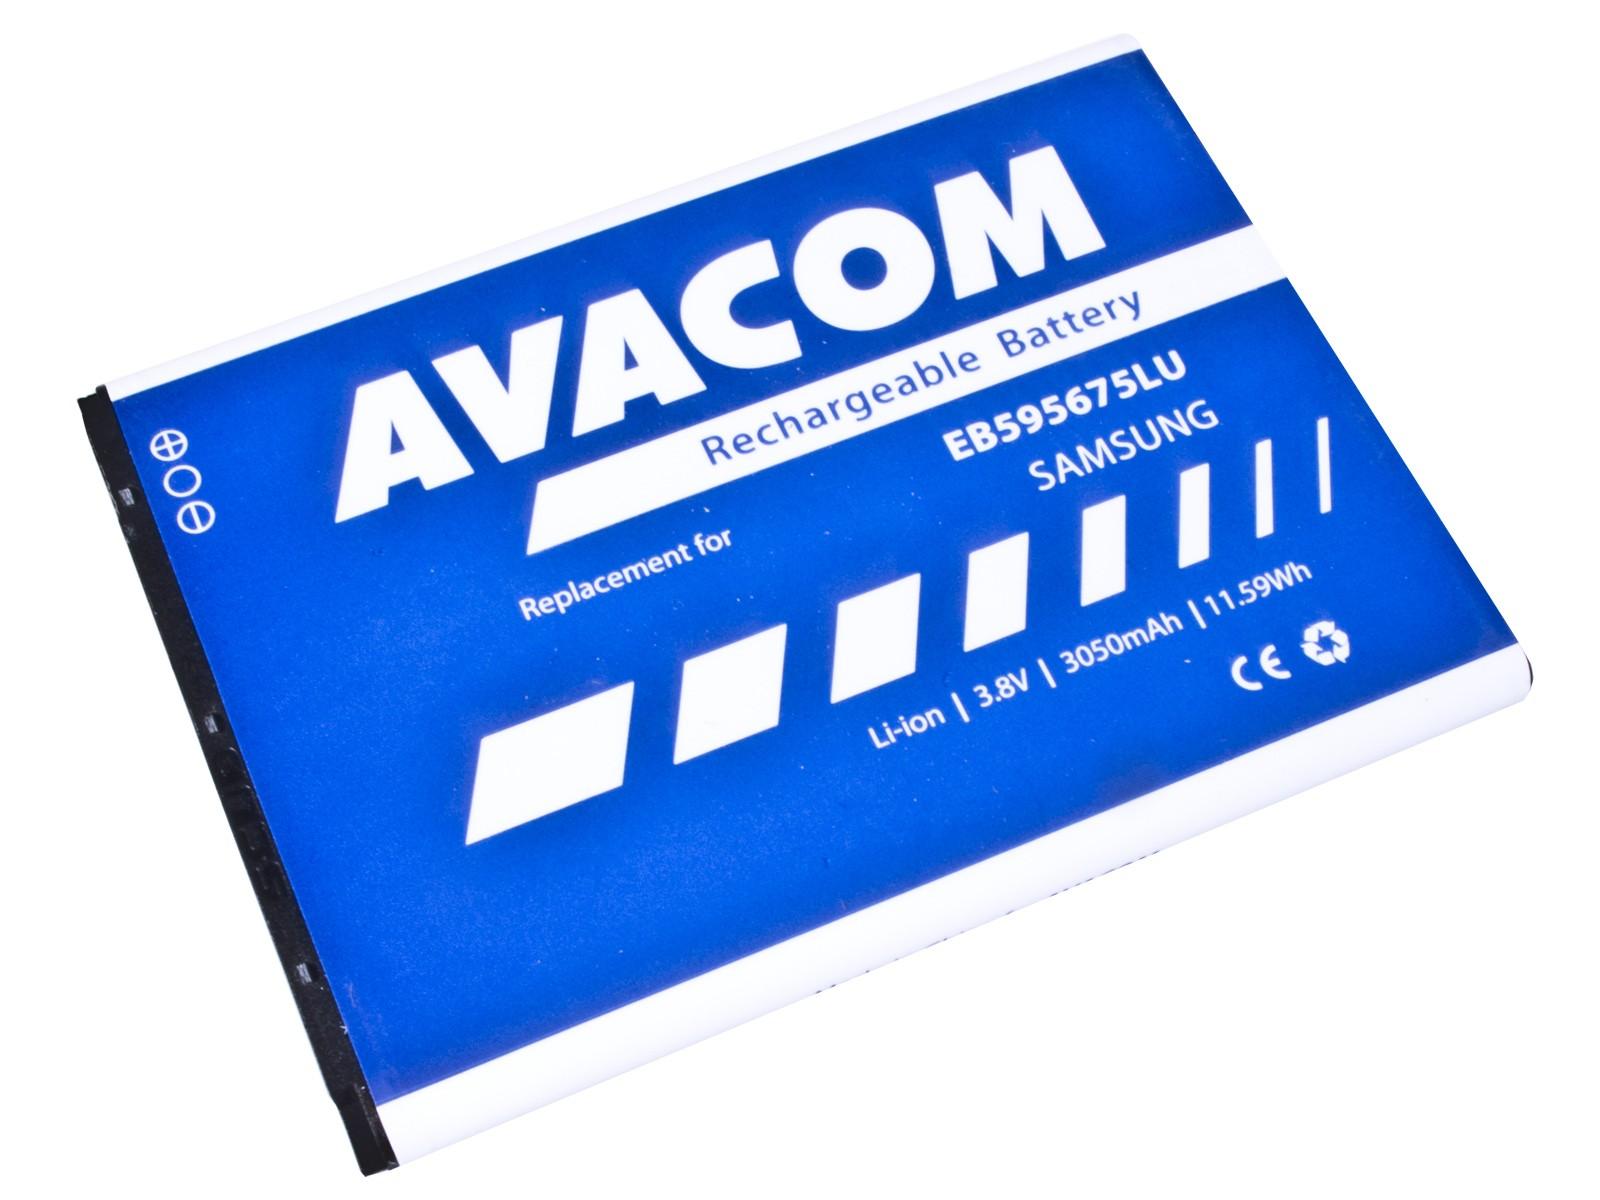 Baterie AVACOM GSSA-N7100-S3050A do mobilu Samsung Galaxy Note 2, Li-Ion 3,8V 3050mAh